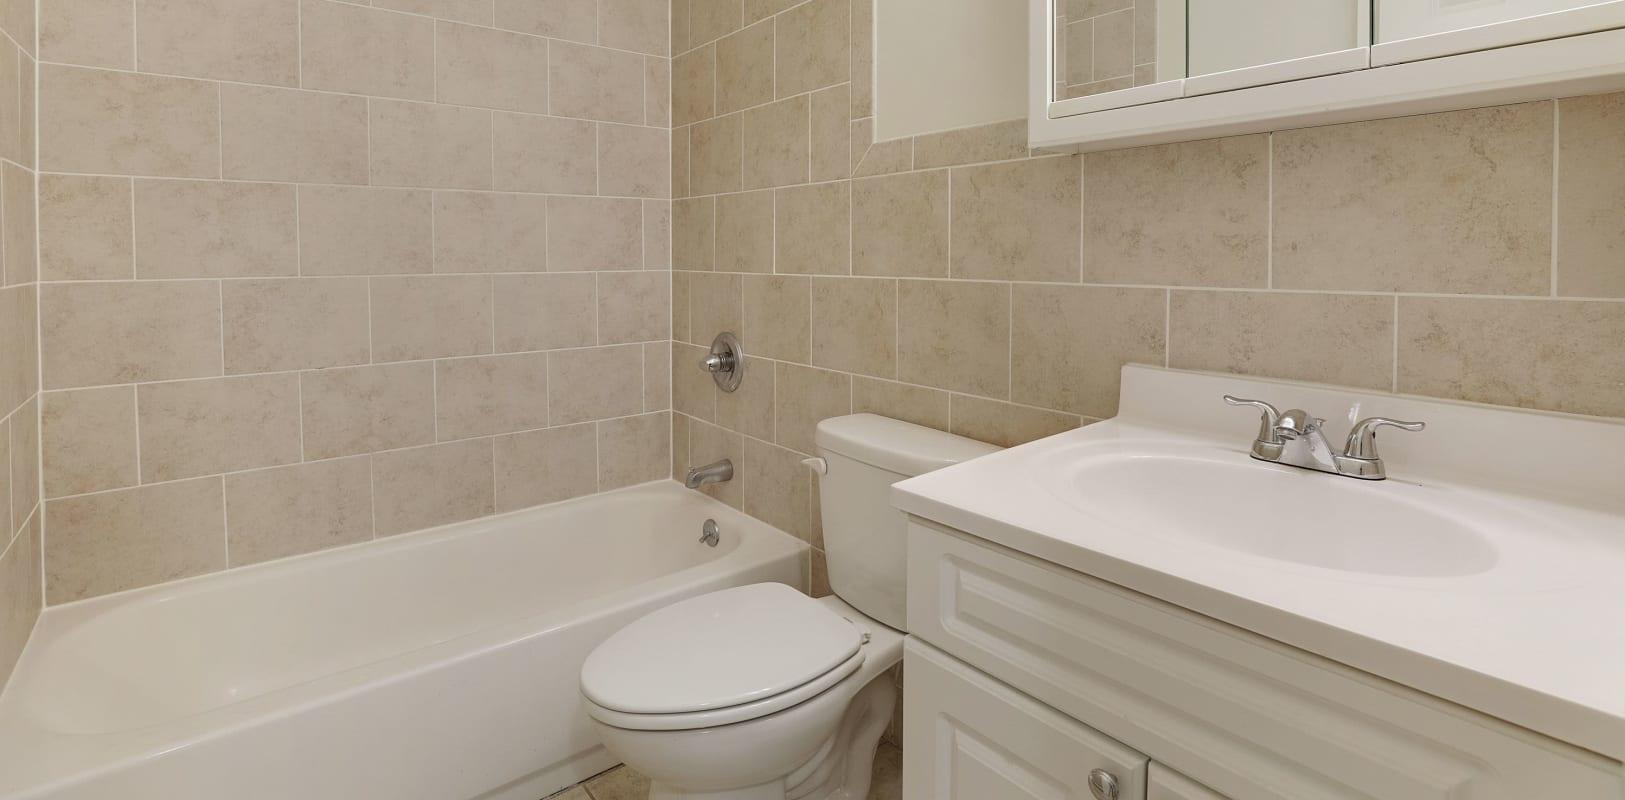 Clean bathroom at Balmoral Arms in Matawan, New Jersey